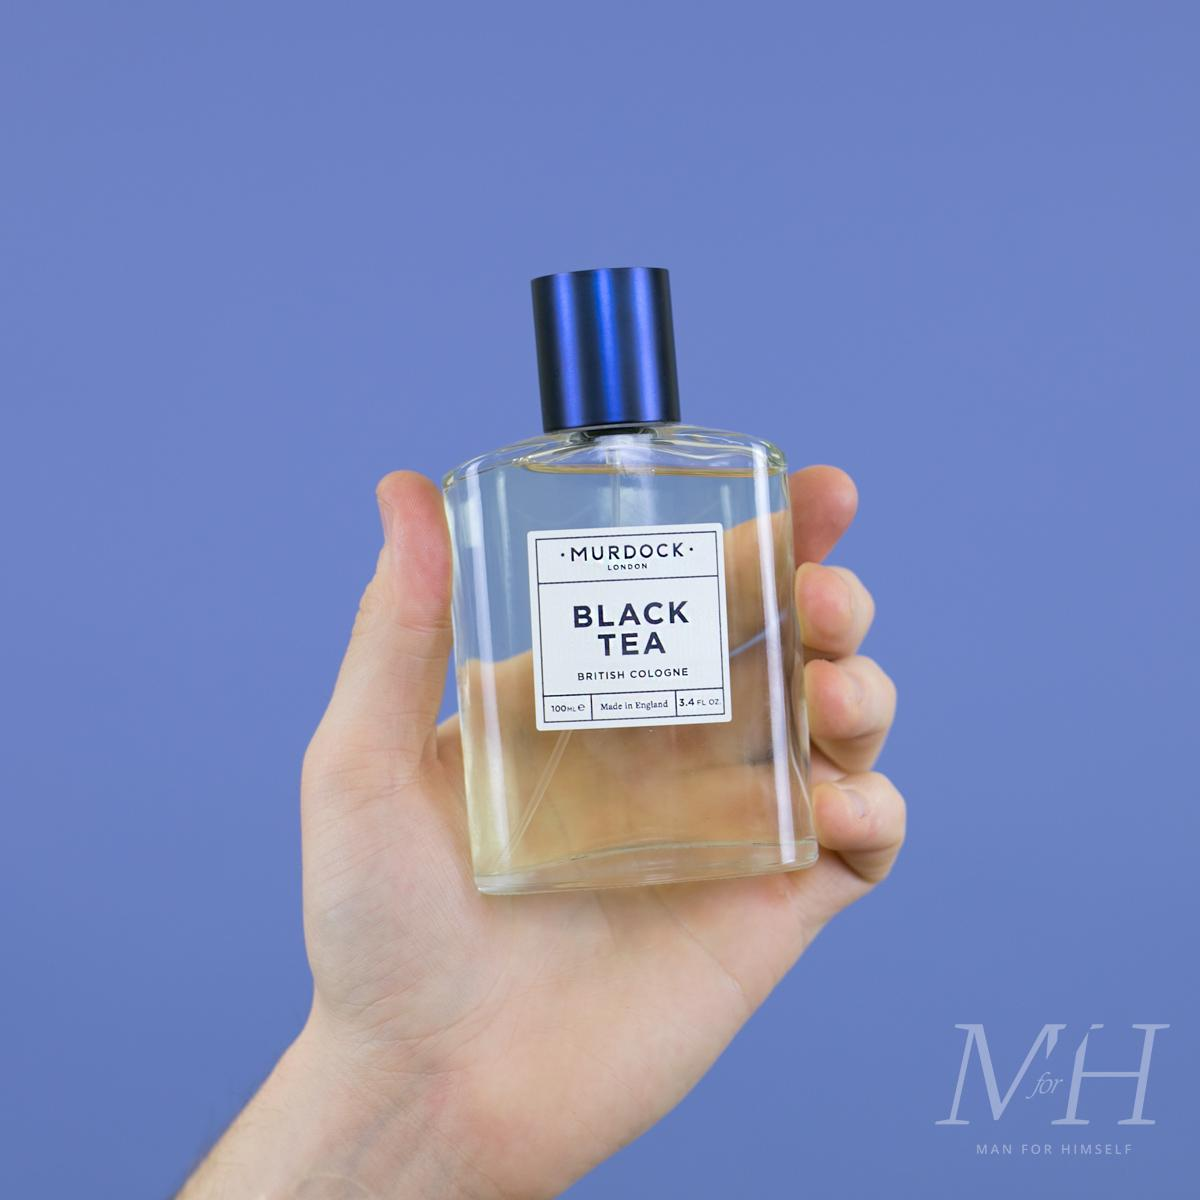 murdock-london-black-tea-review-man-for-himself